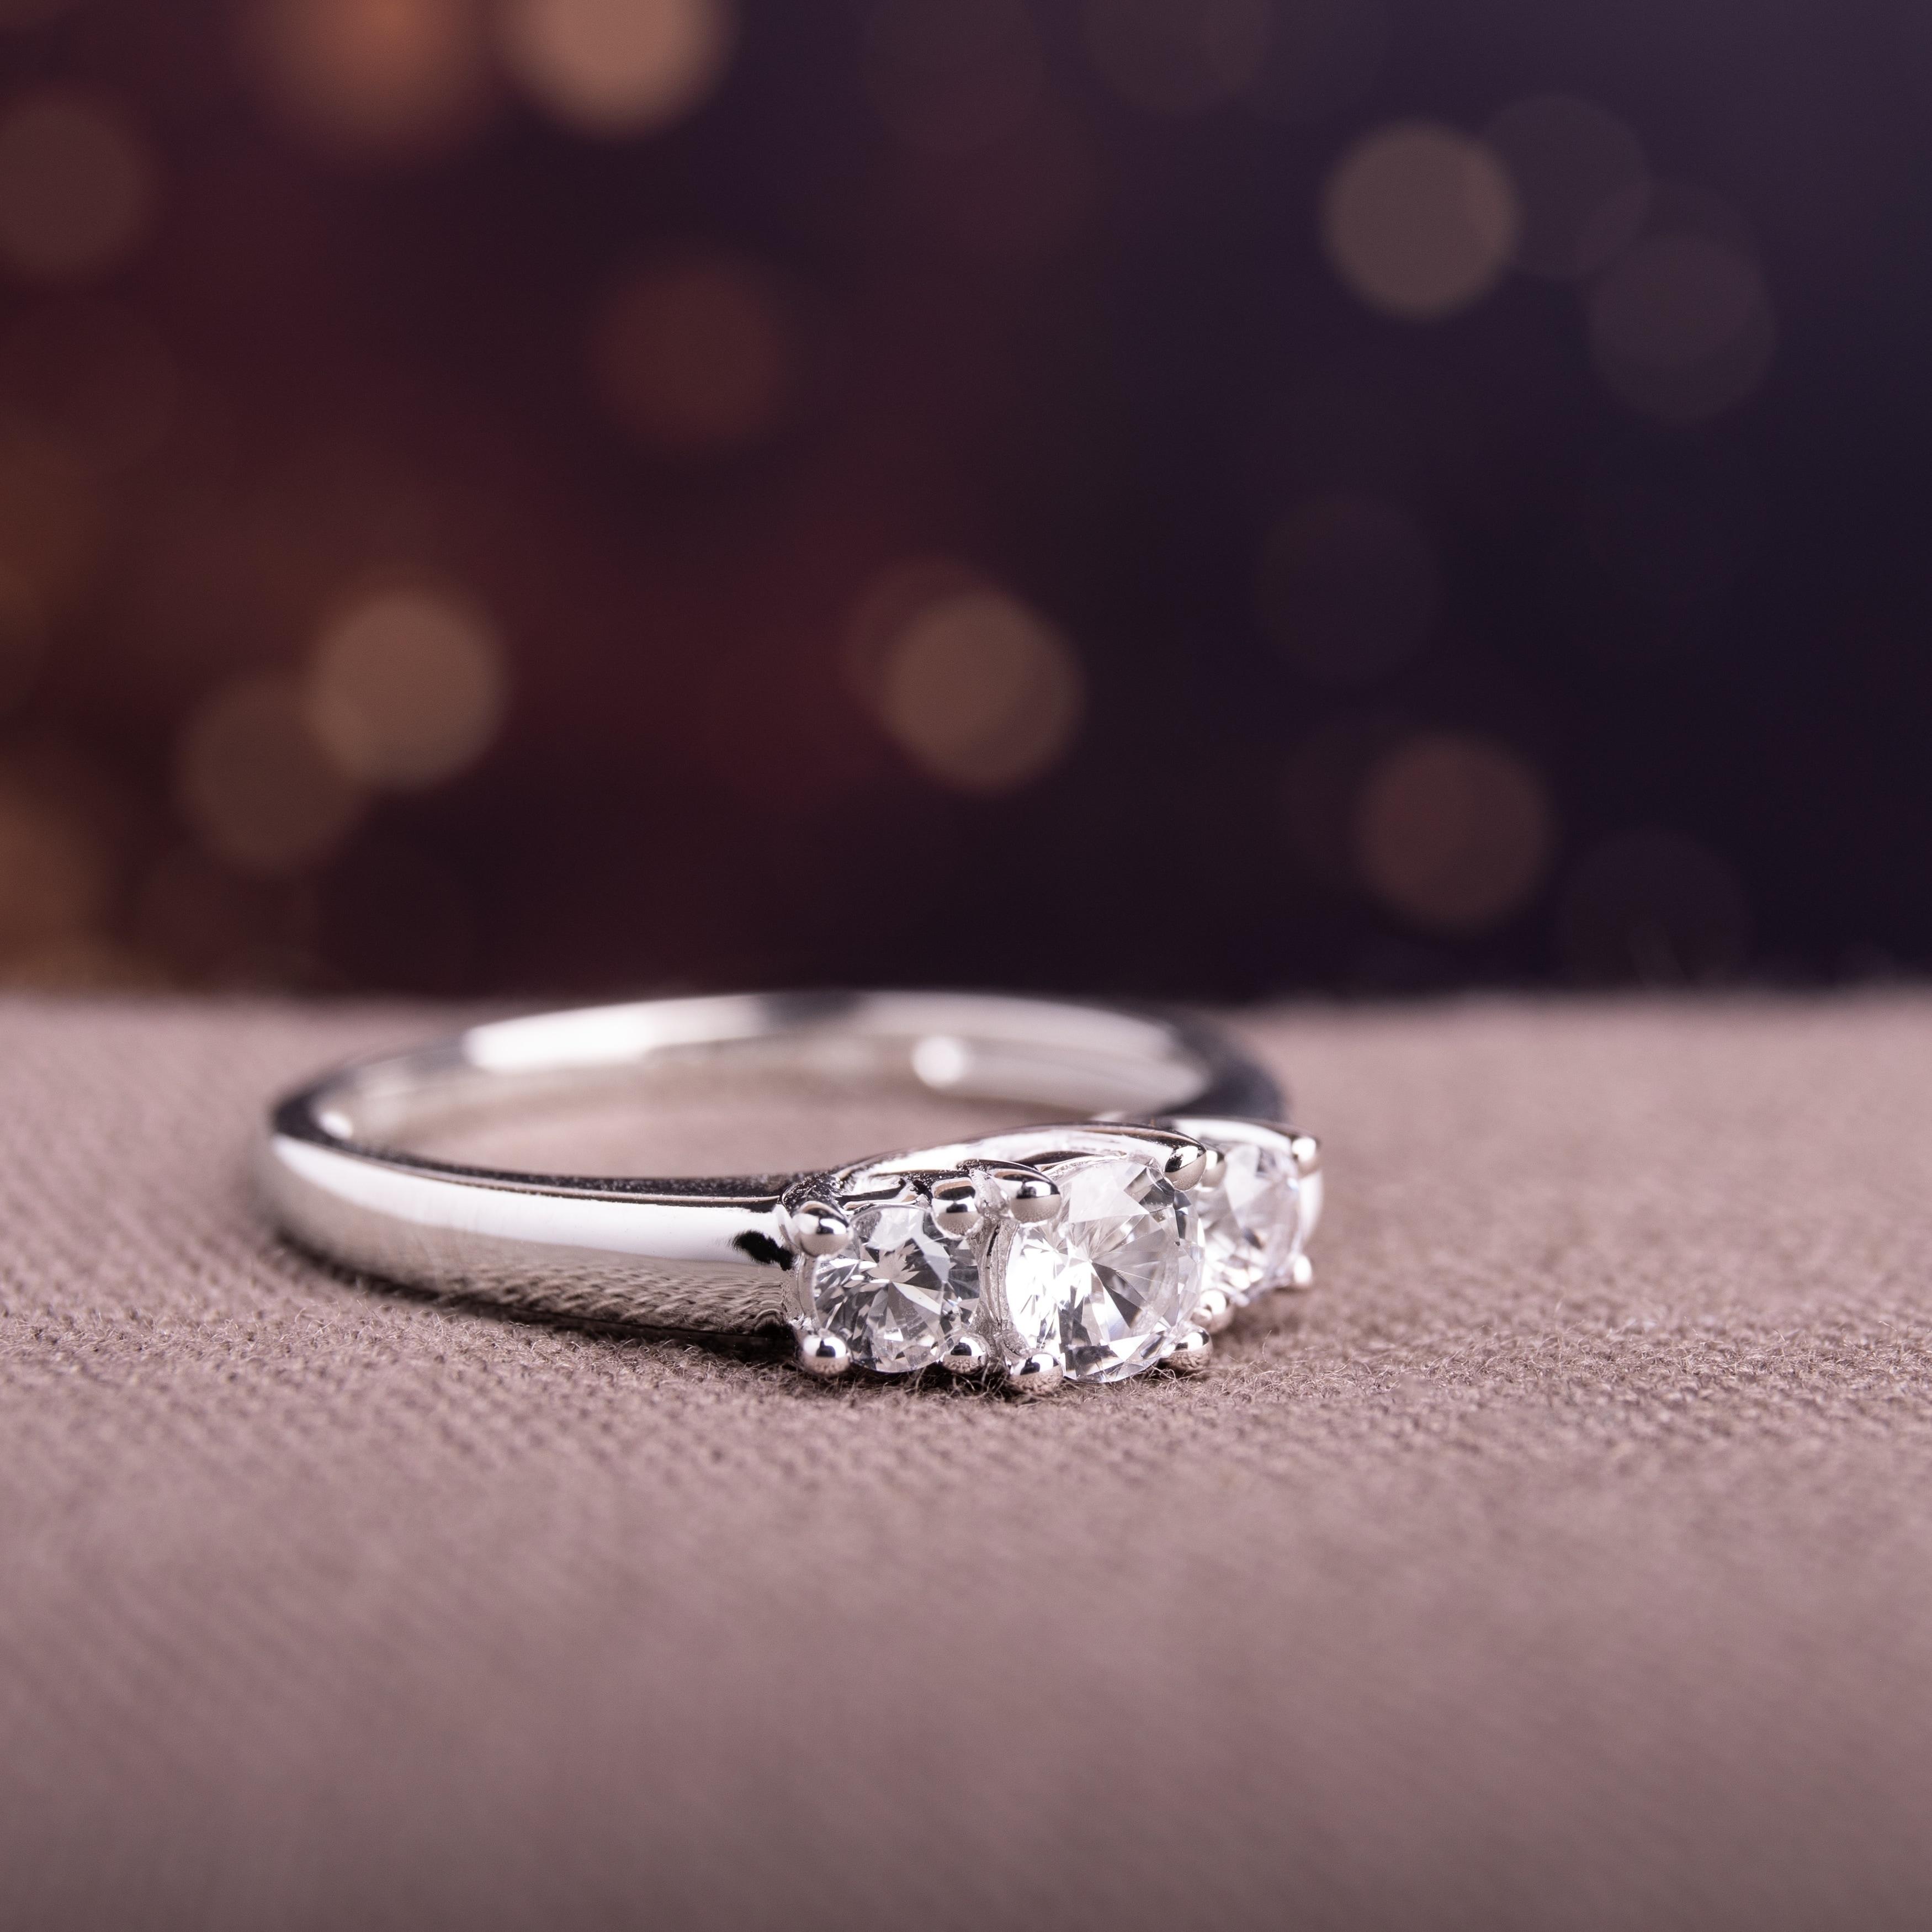 Buy Black Engagement Rings Online At Overstock Our Best Wedding Deals: Gar Diamond Wedding Rings Women At Websimilar.org